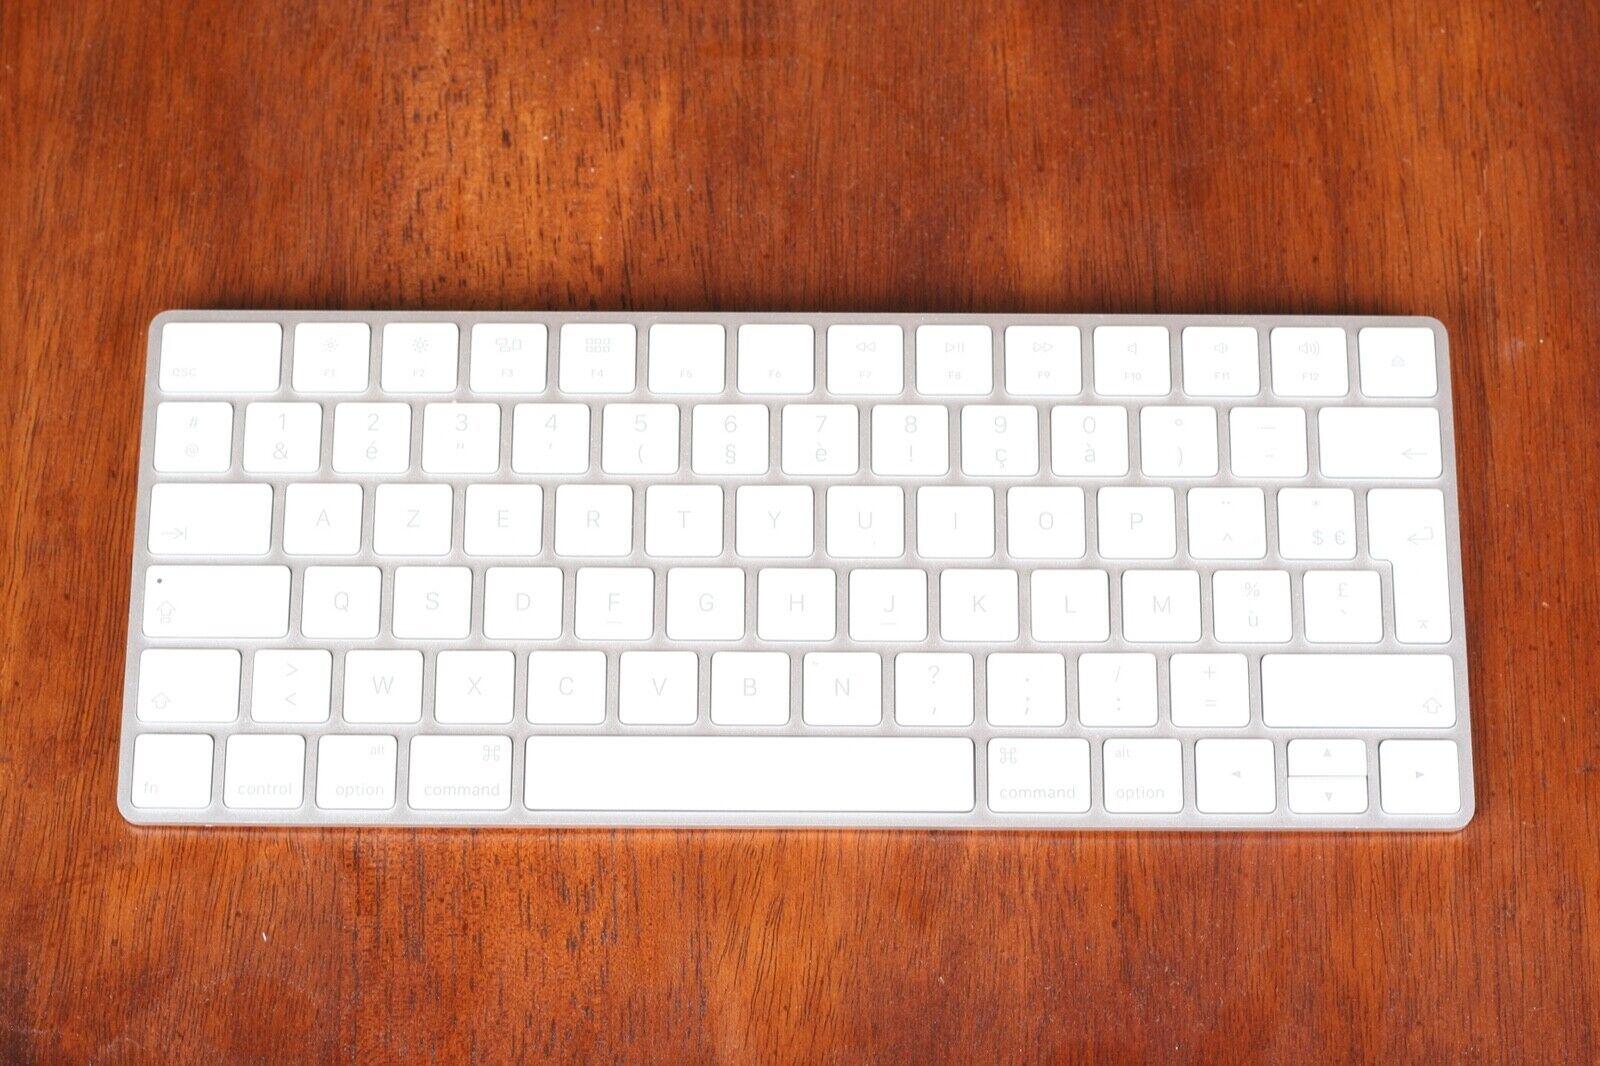 Apple Magic Keyboard 2 A1644 Wireless, Rechargable French AZERTY - $9.99